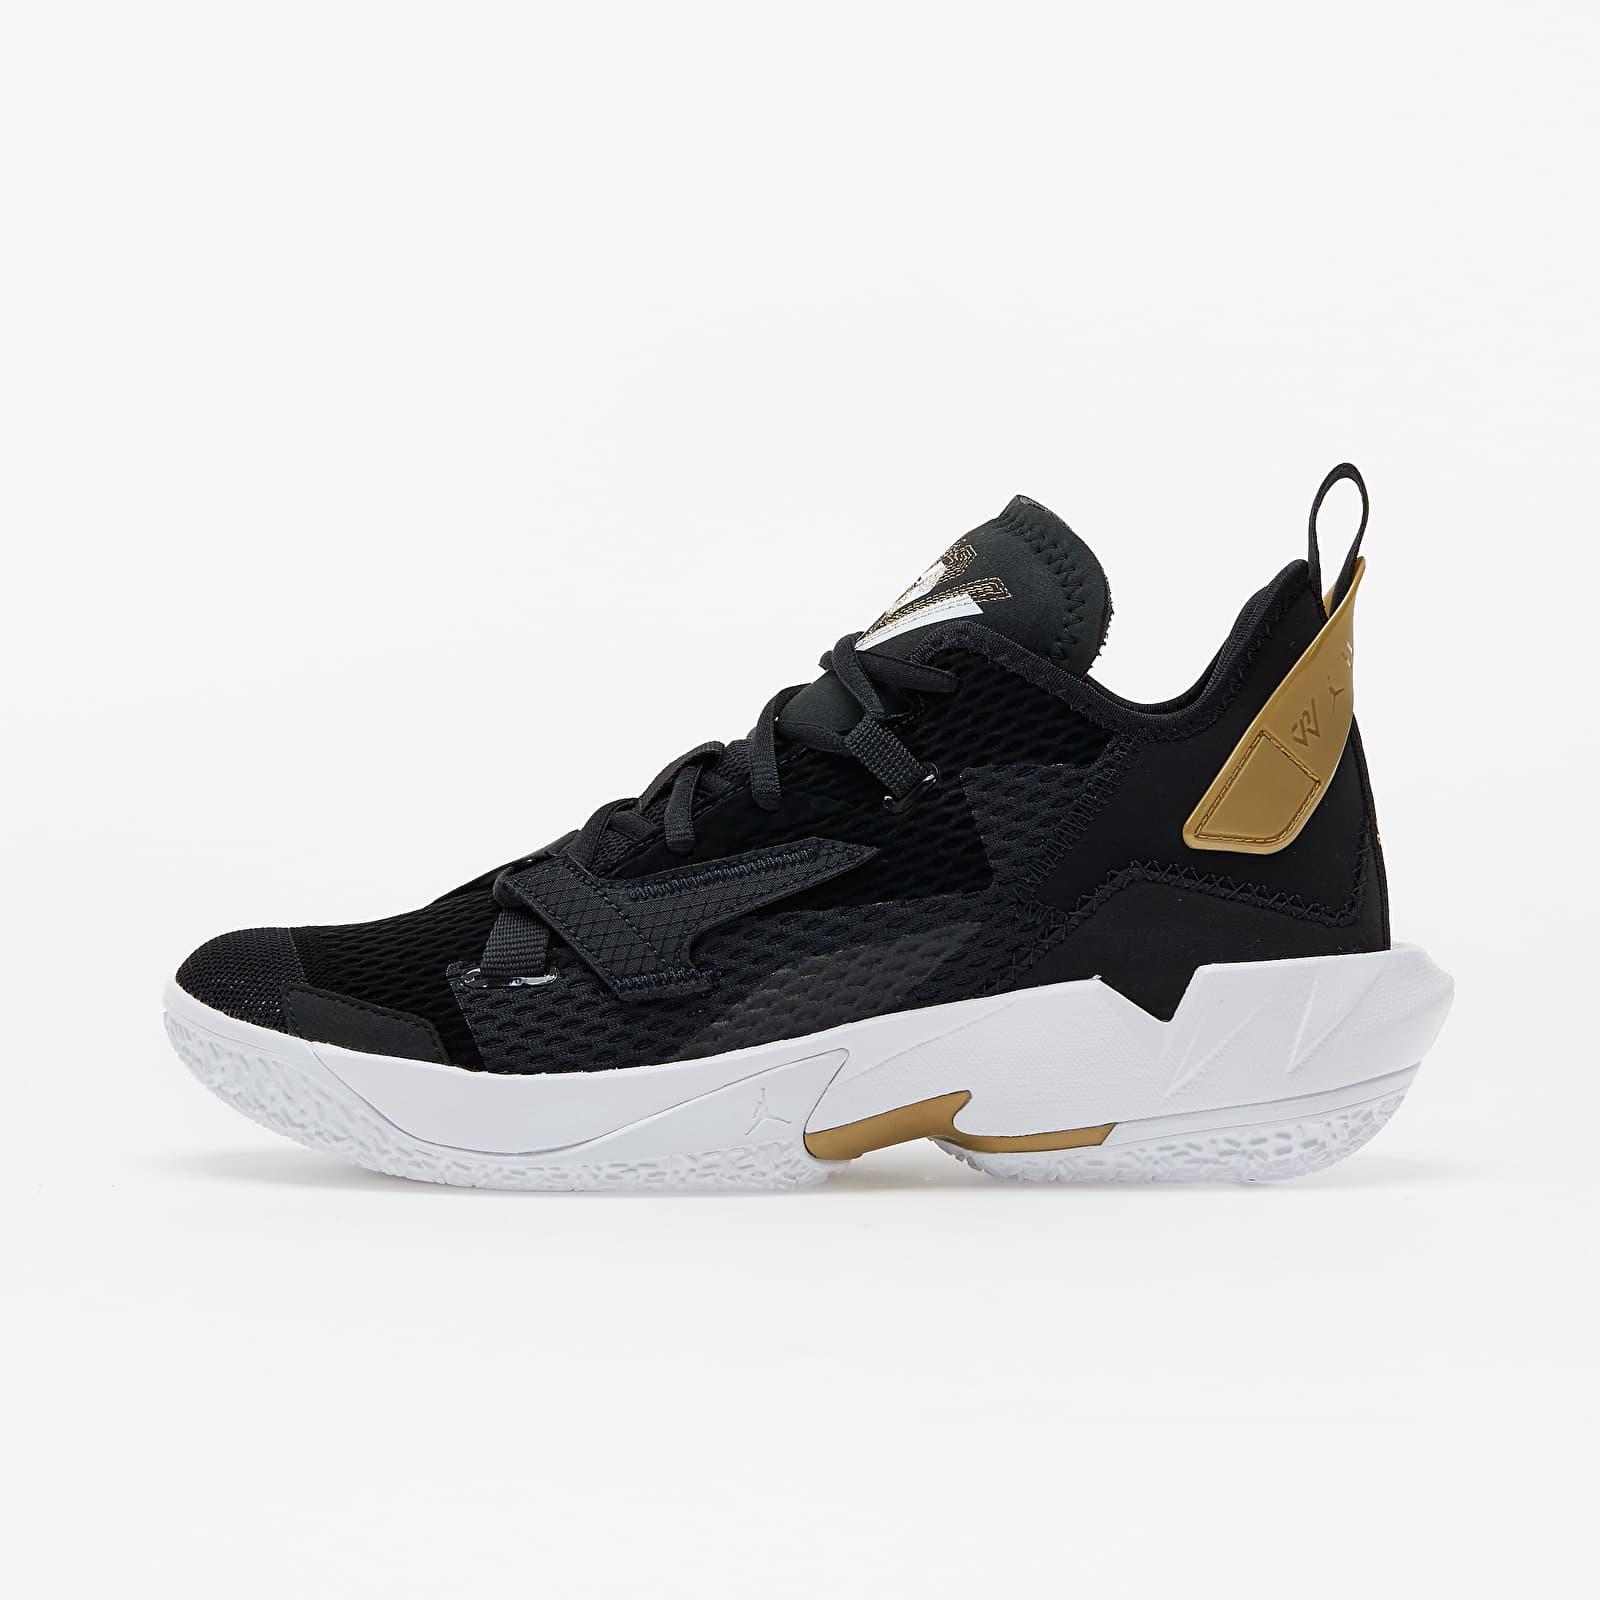 "Jordan Why Not? Zer0.4 ""Family"" Black/ White-Metallic Gold CQ4230-001"